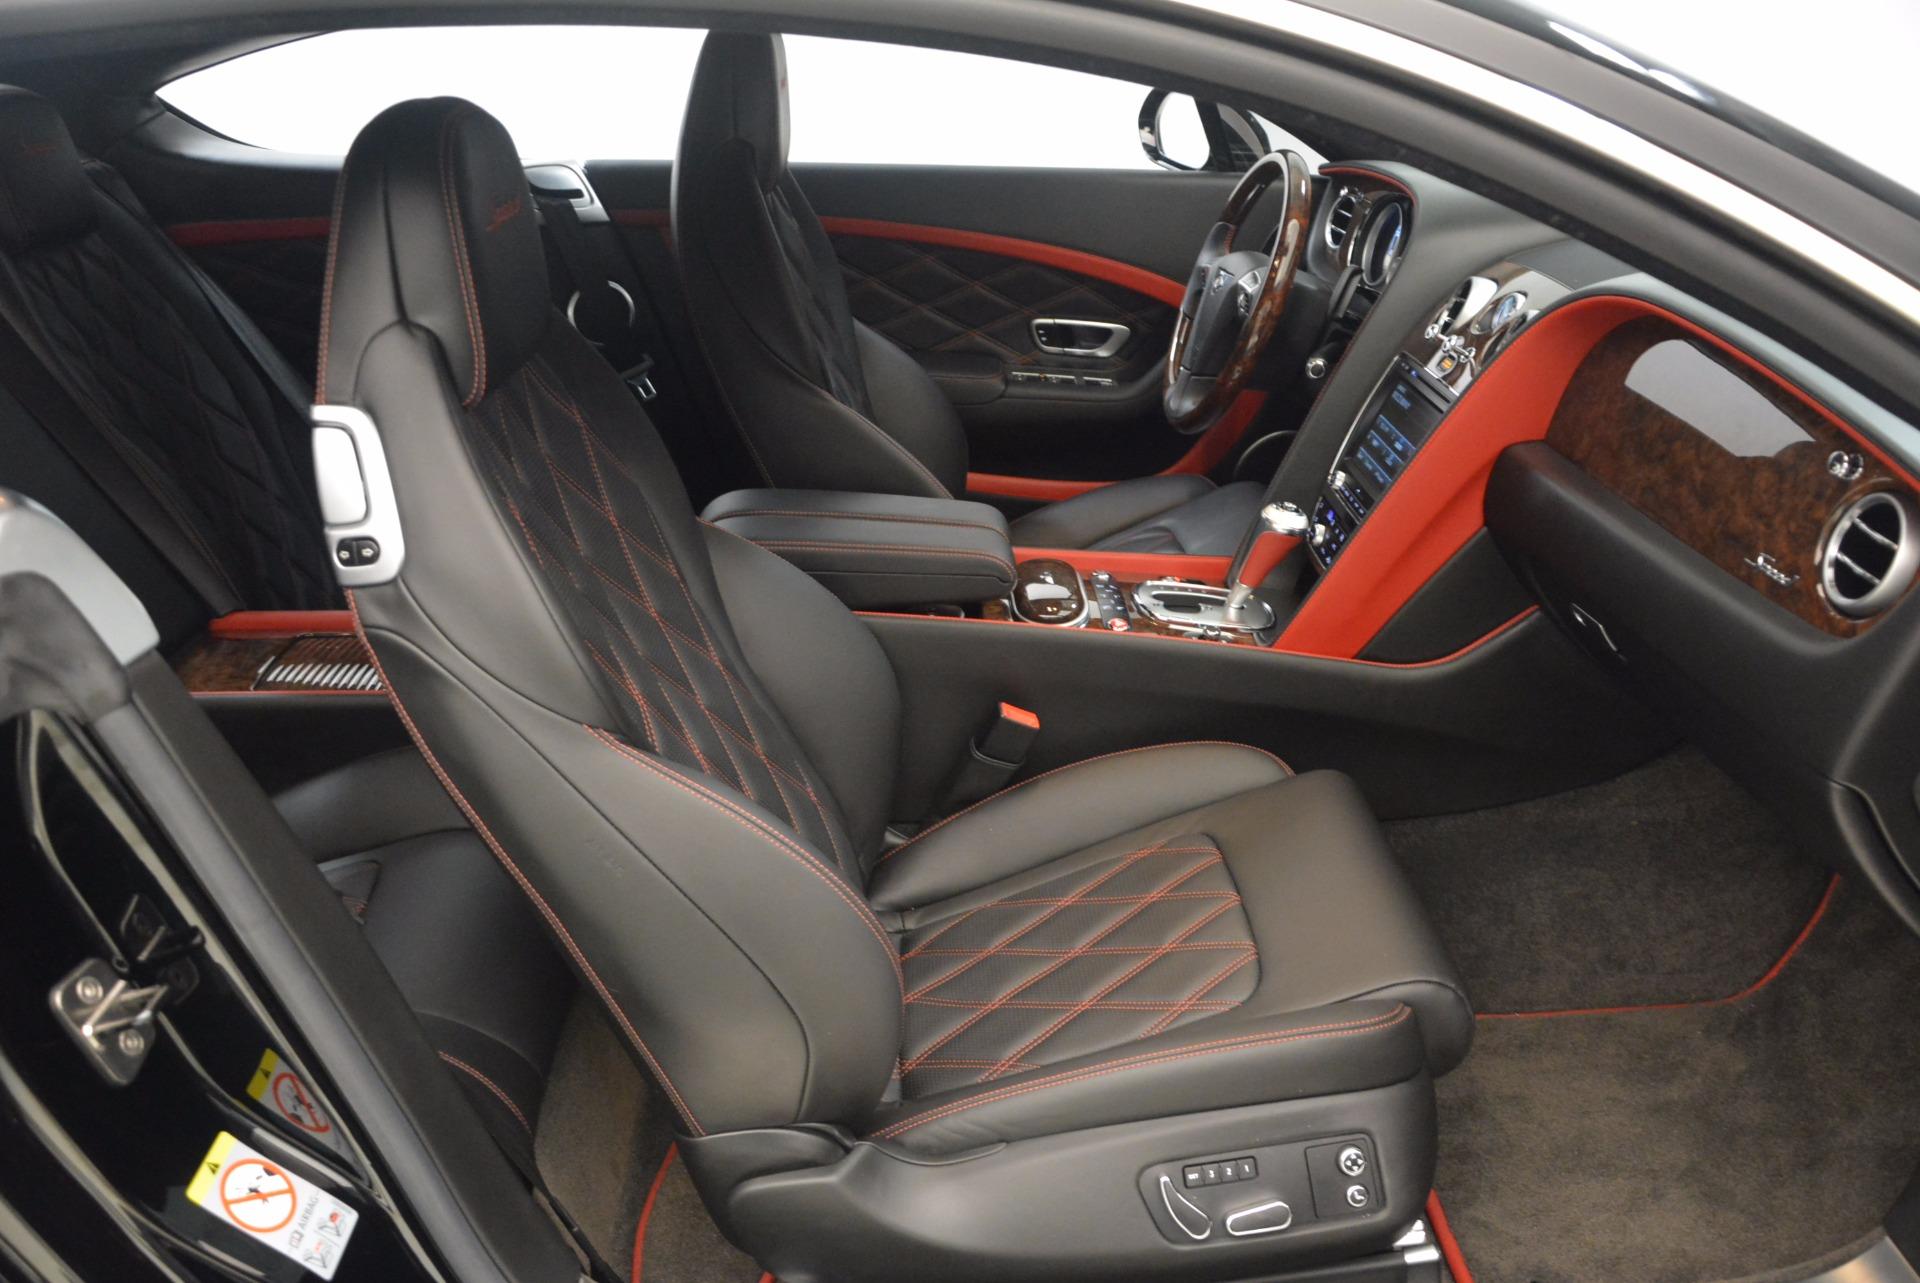 Used 2015 Bentley Continental GT Speed For Sale In Westport, CT 1646_p34